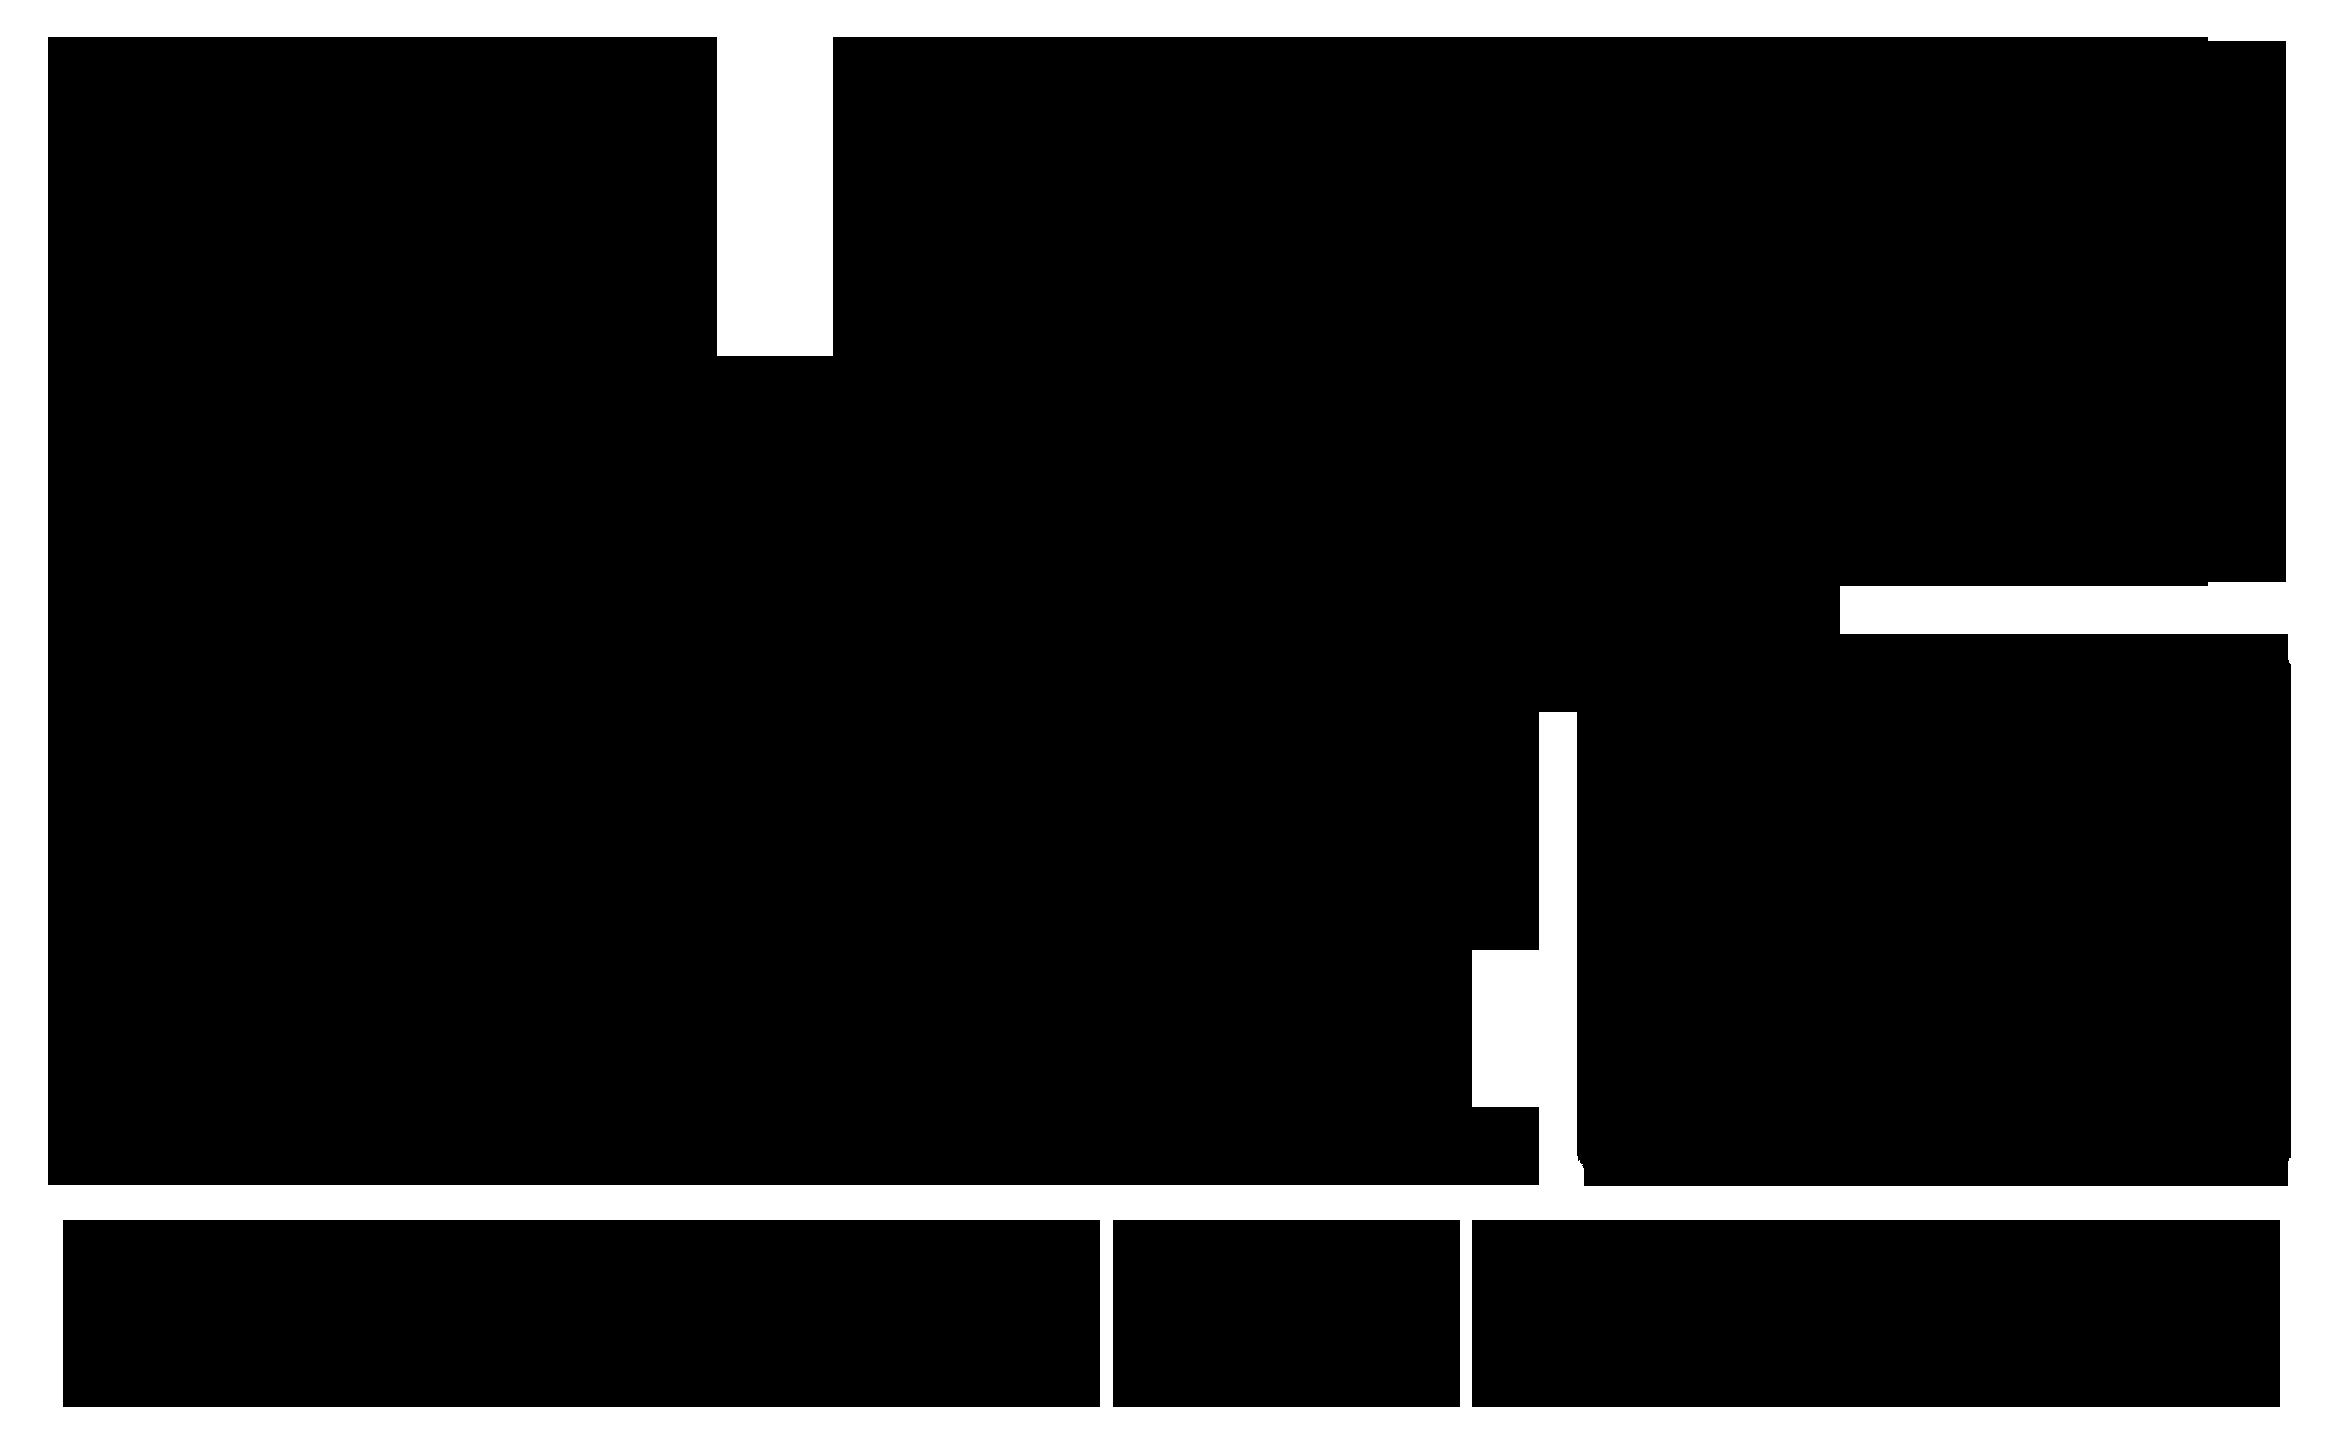 https://cdn2.szigetfestival.com/ca9s5s/f851/fr/media/2018/05/clubbinghouse_logo_noir_url.png